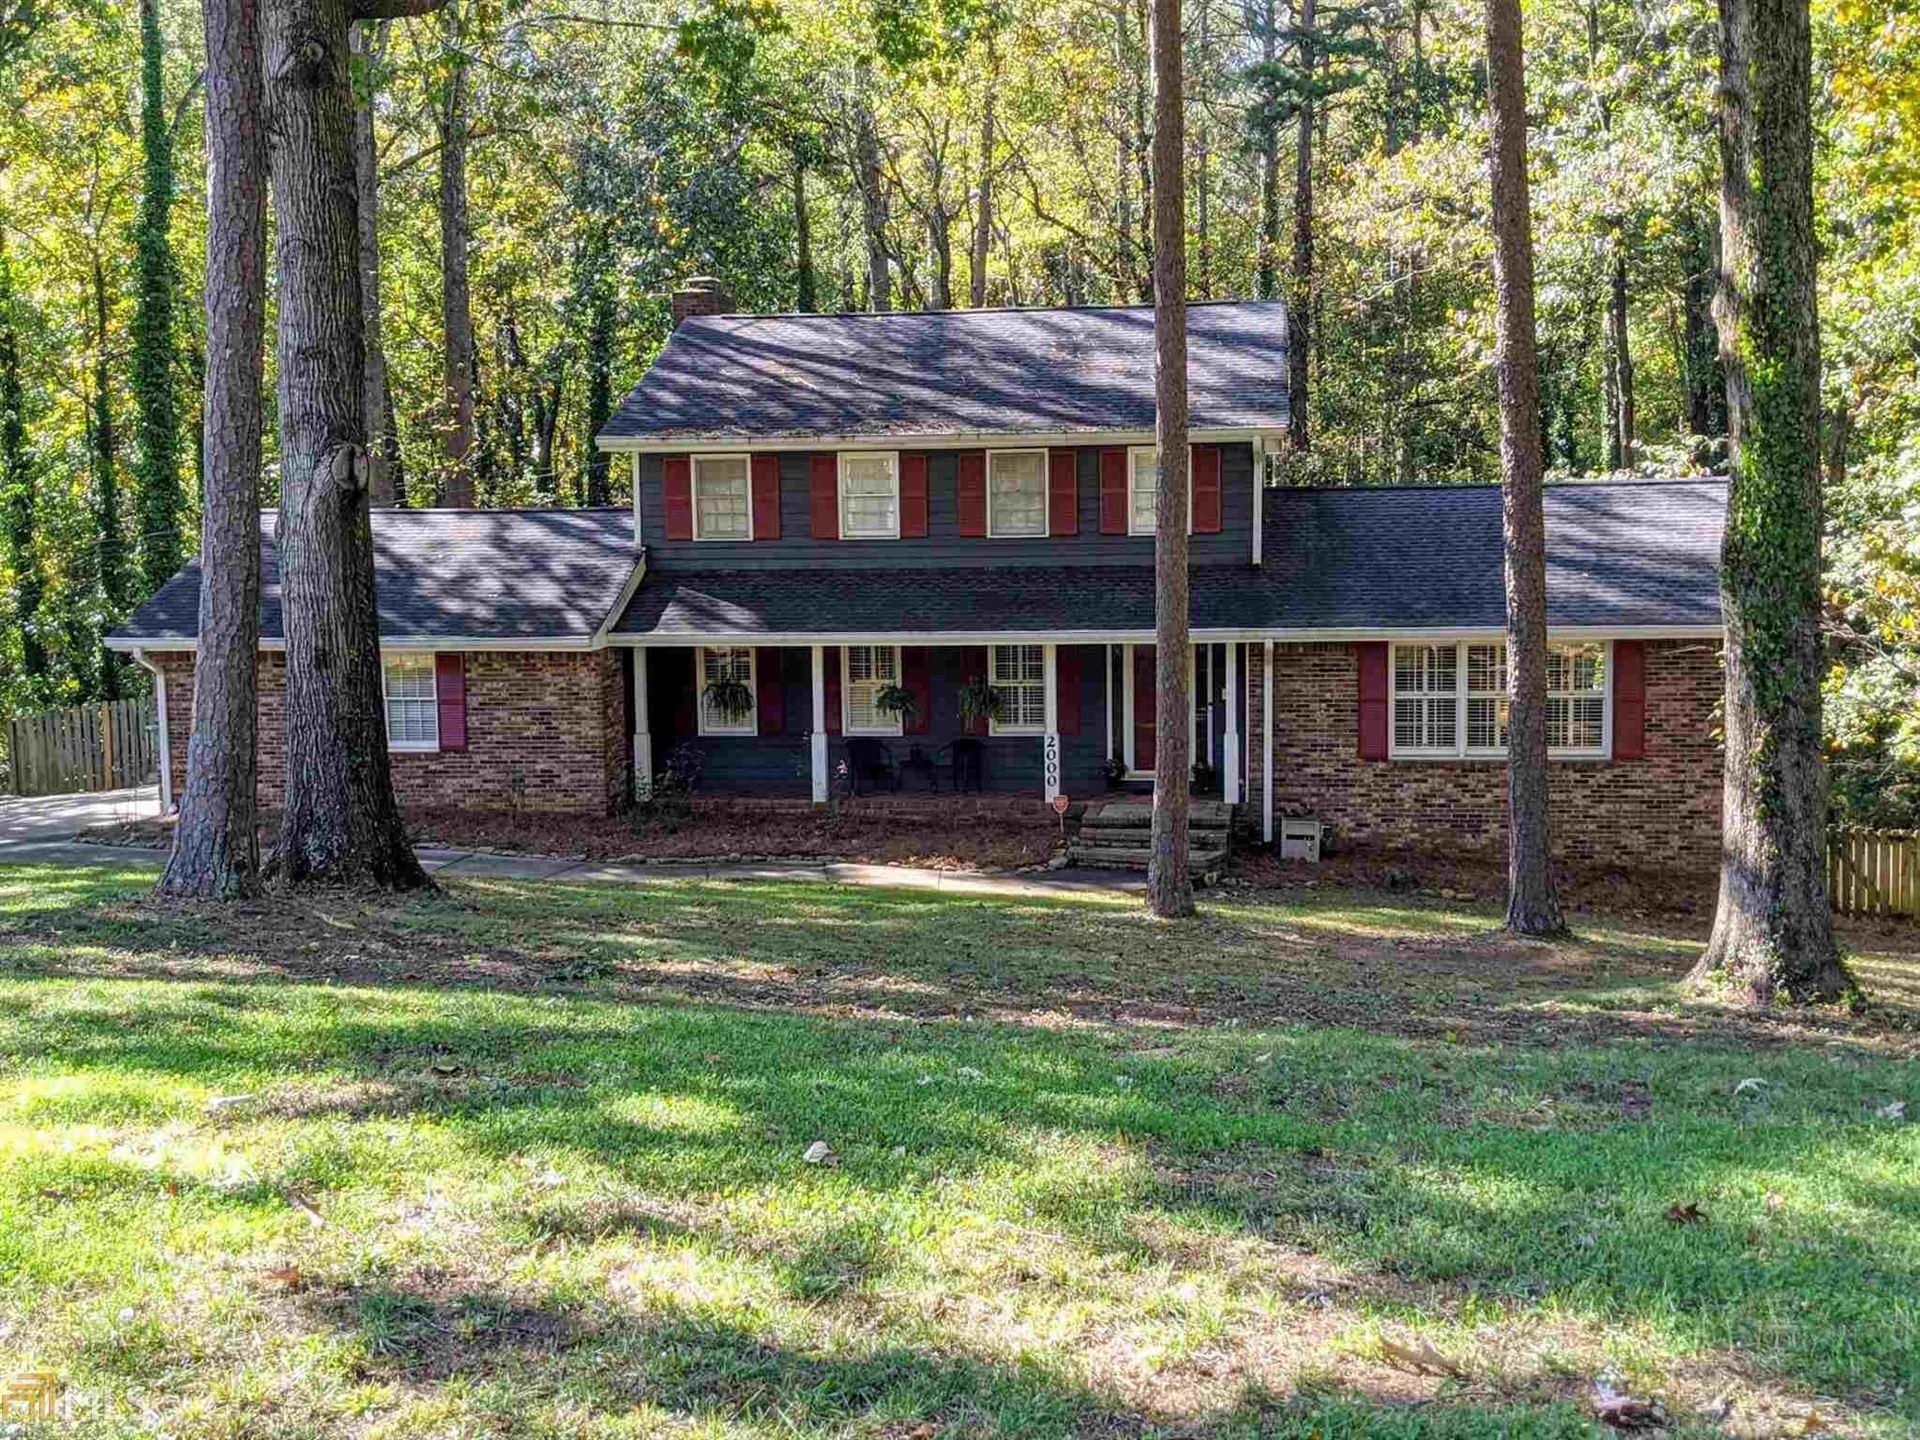 2000 Fairgreen, Stone Mountain, GA 30087 - MLS#: 8886793